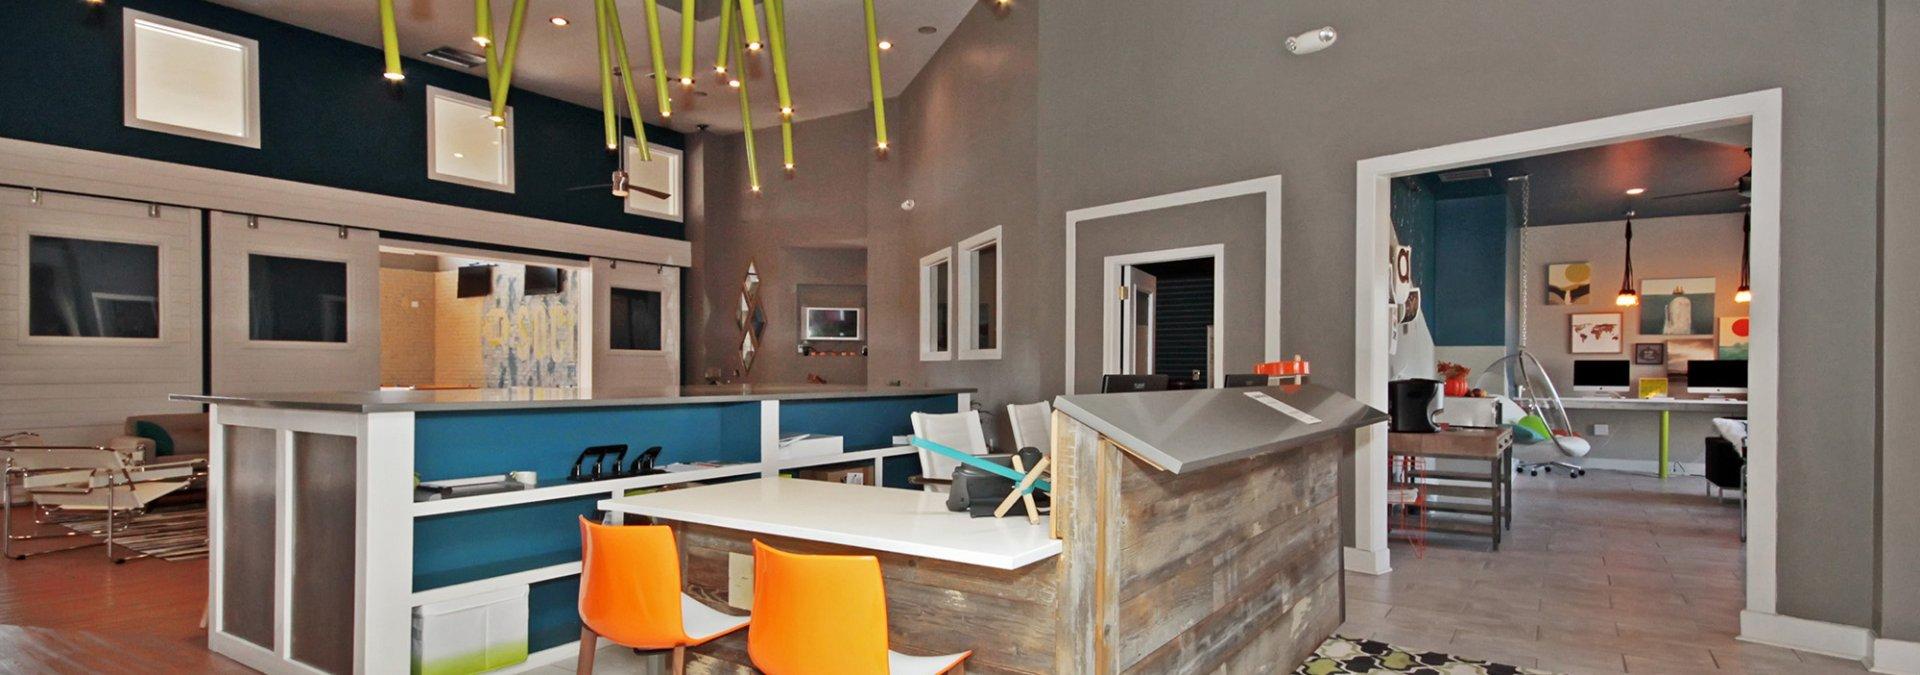 Apartments In Auburn AL | The Social at Aurburn 2